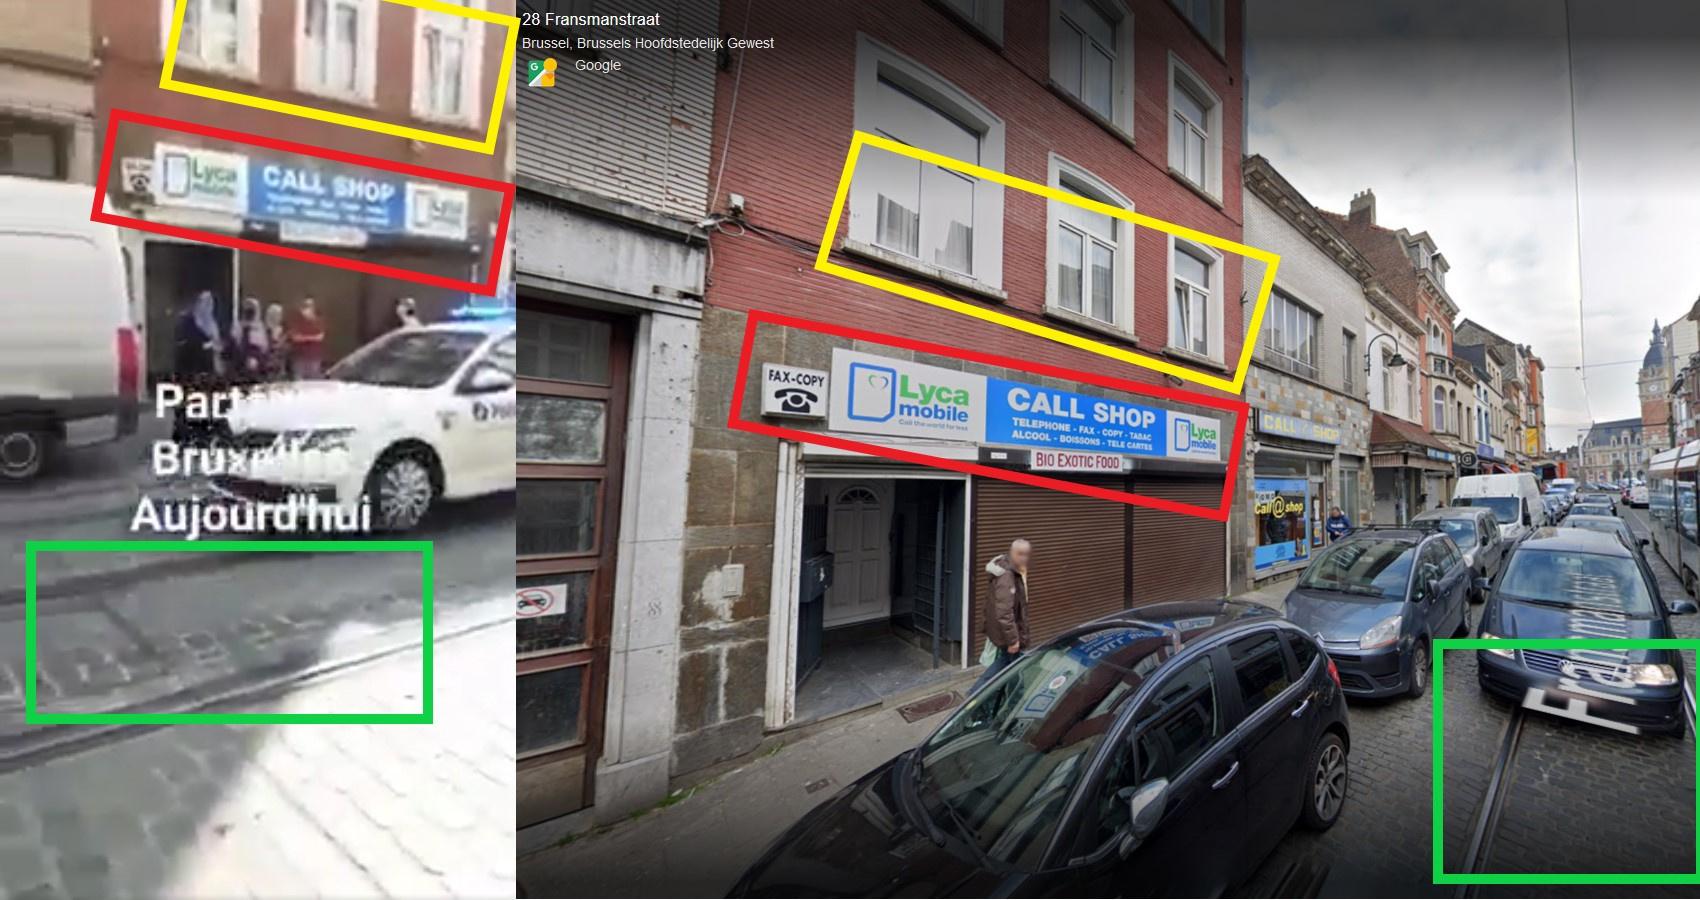 Facebook/Google Streetview